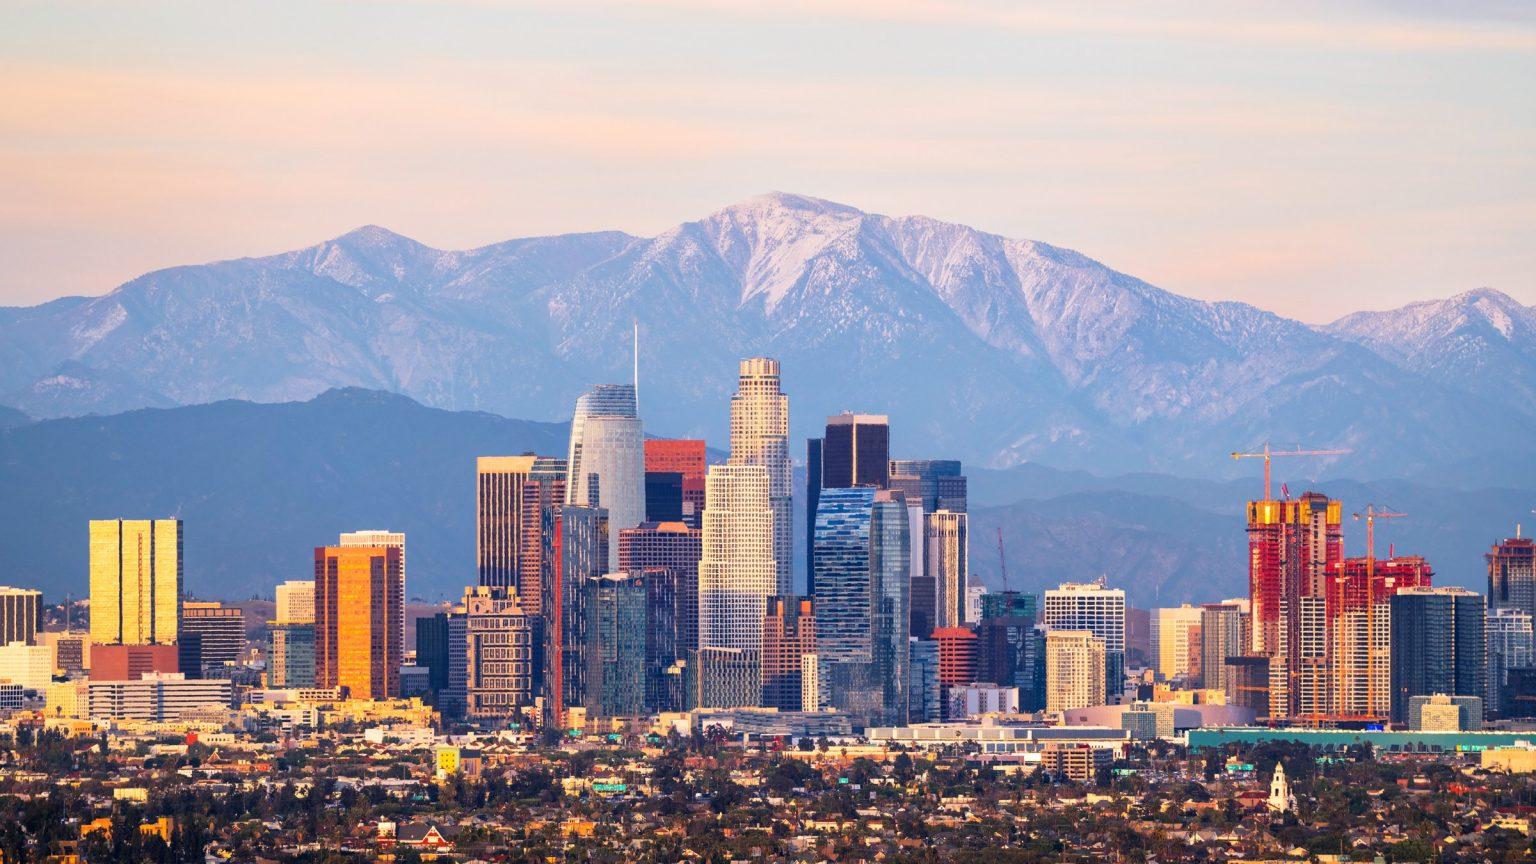 10 Best Los Angeles Scholarships 2020 for International Student